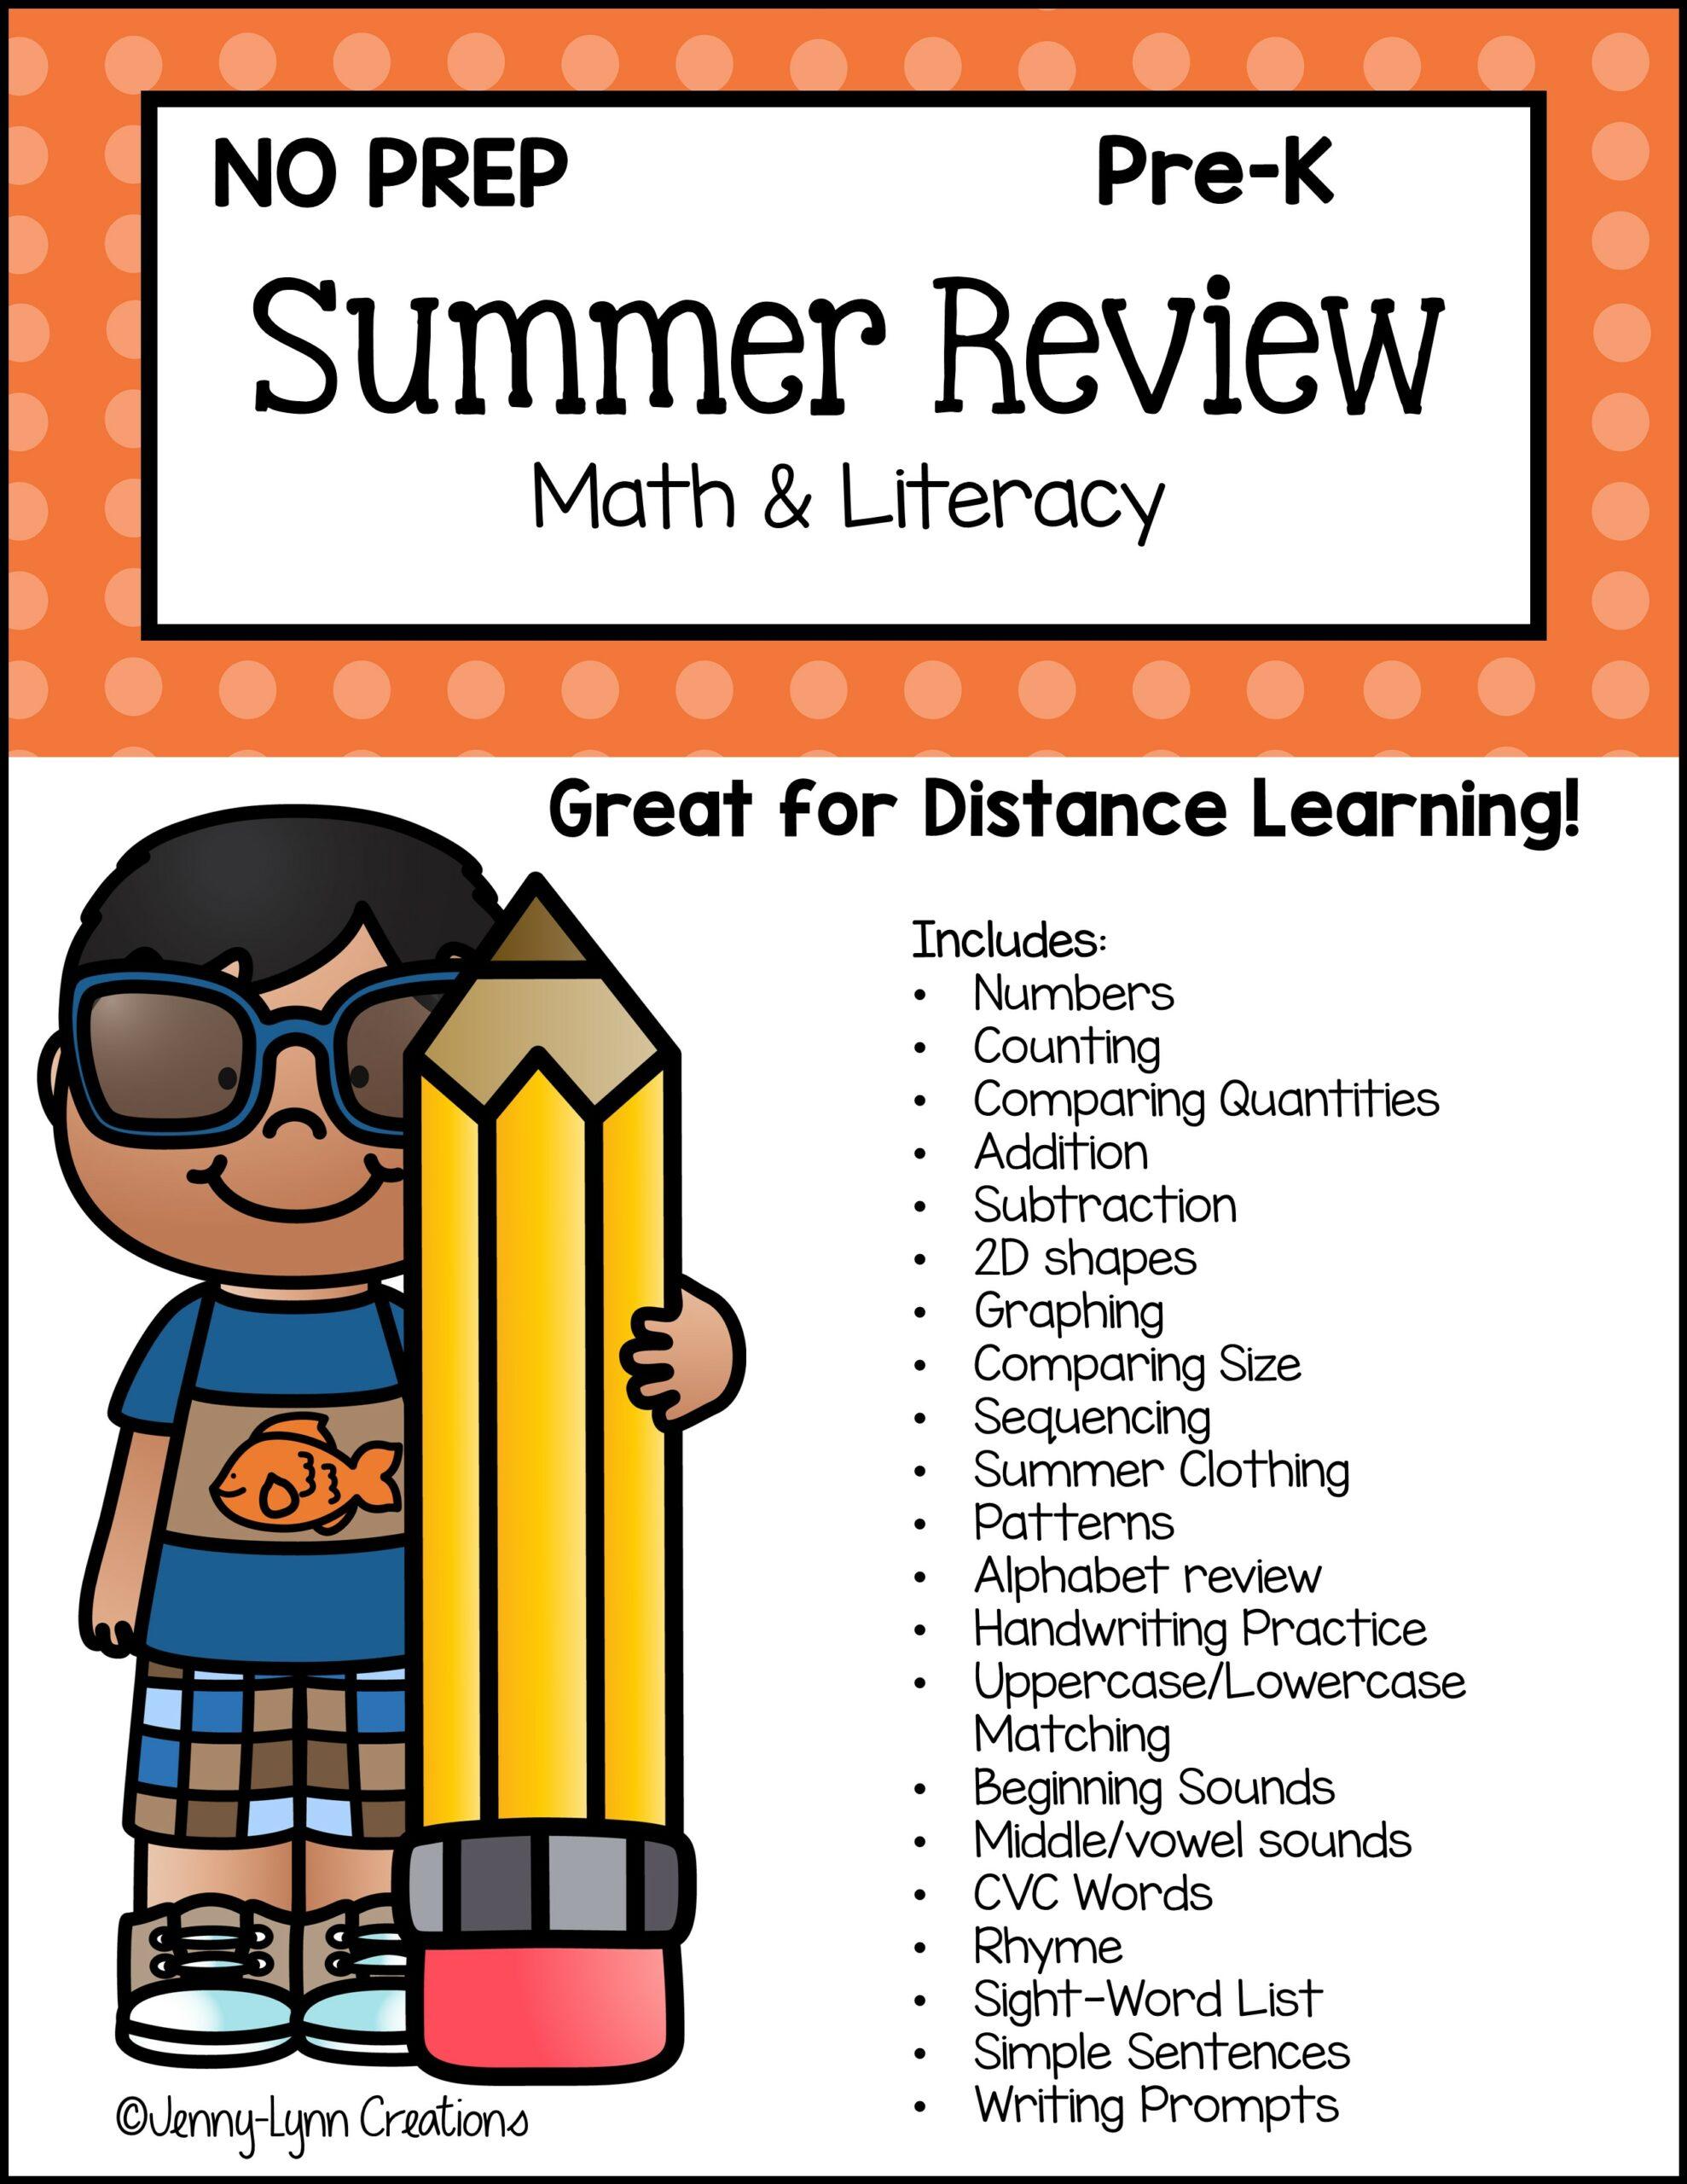 Preschool Summer Review Math and Literacy Workbook Printable